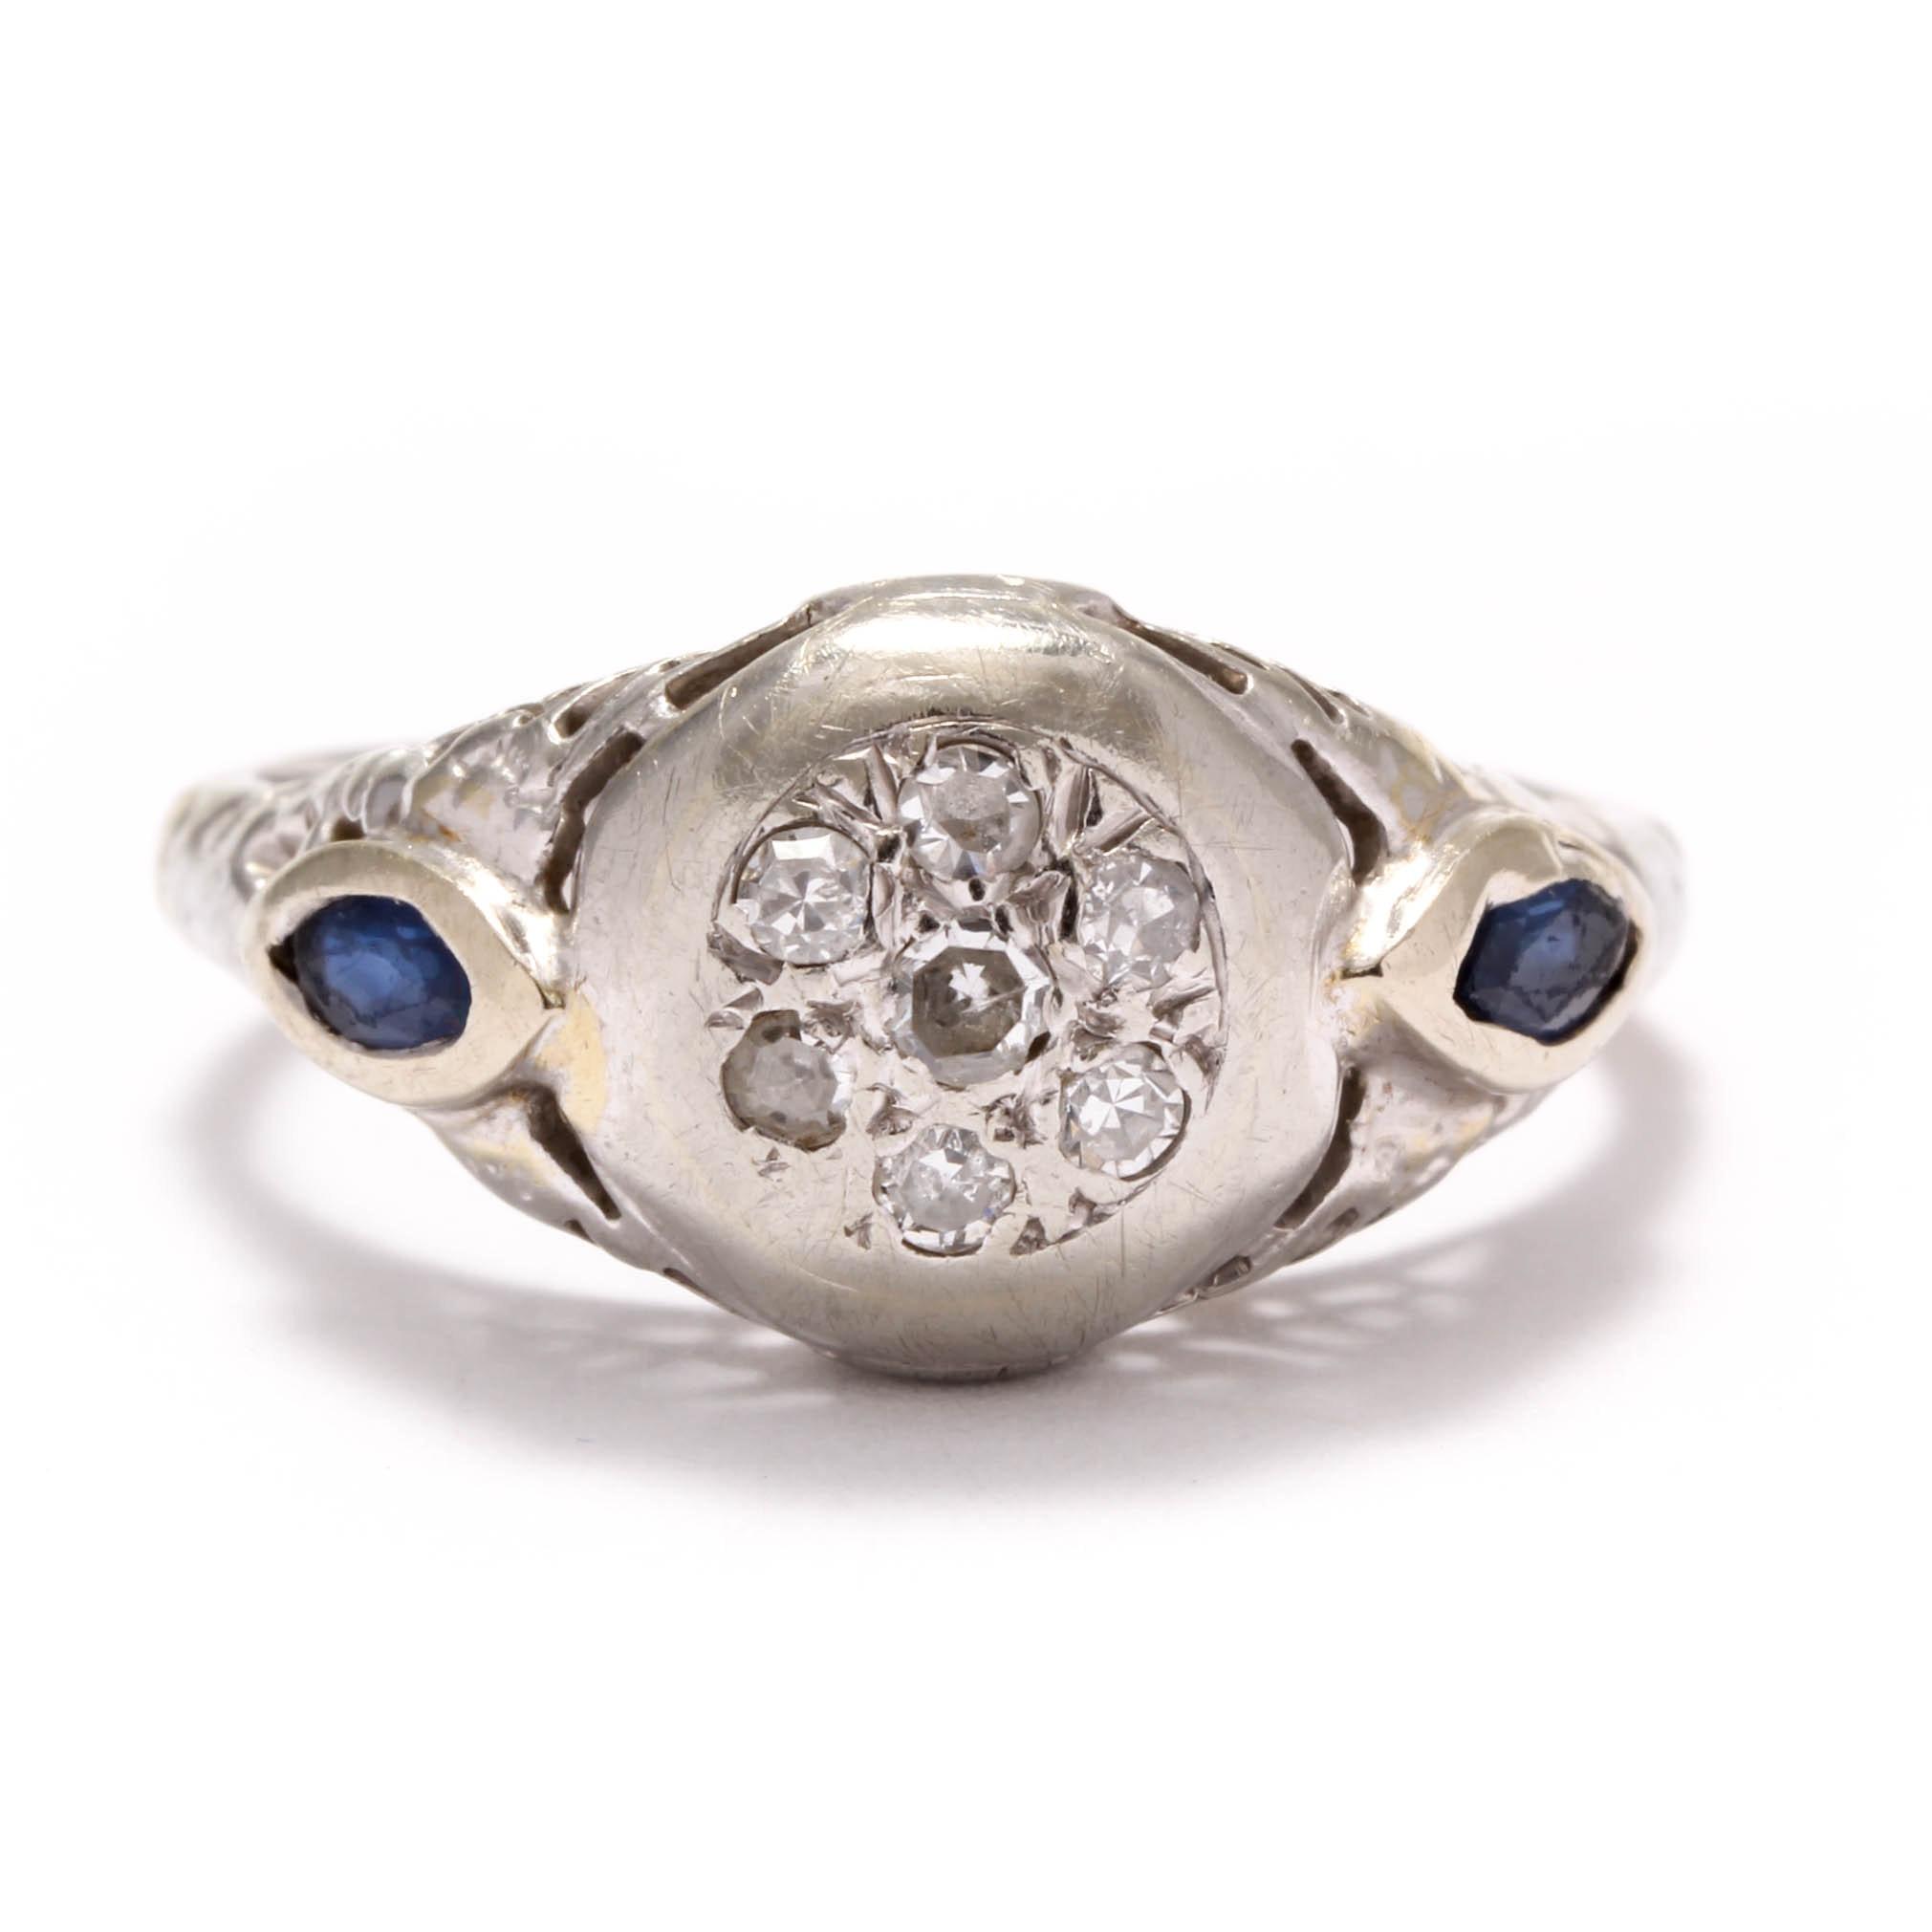 Late Edwardian 14K White Gold Diamond and Sapphire Ring